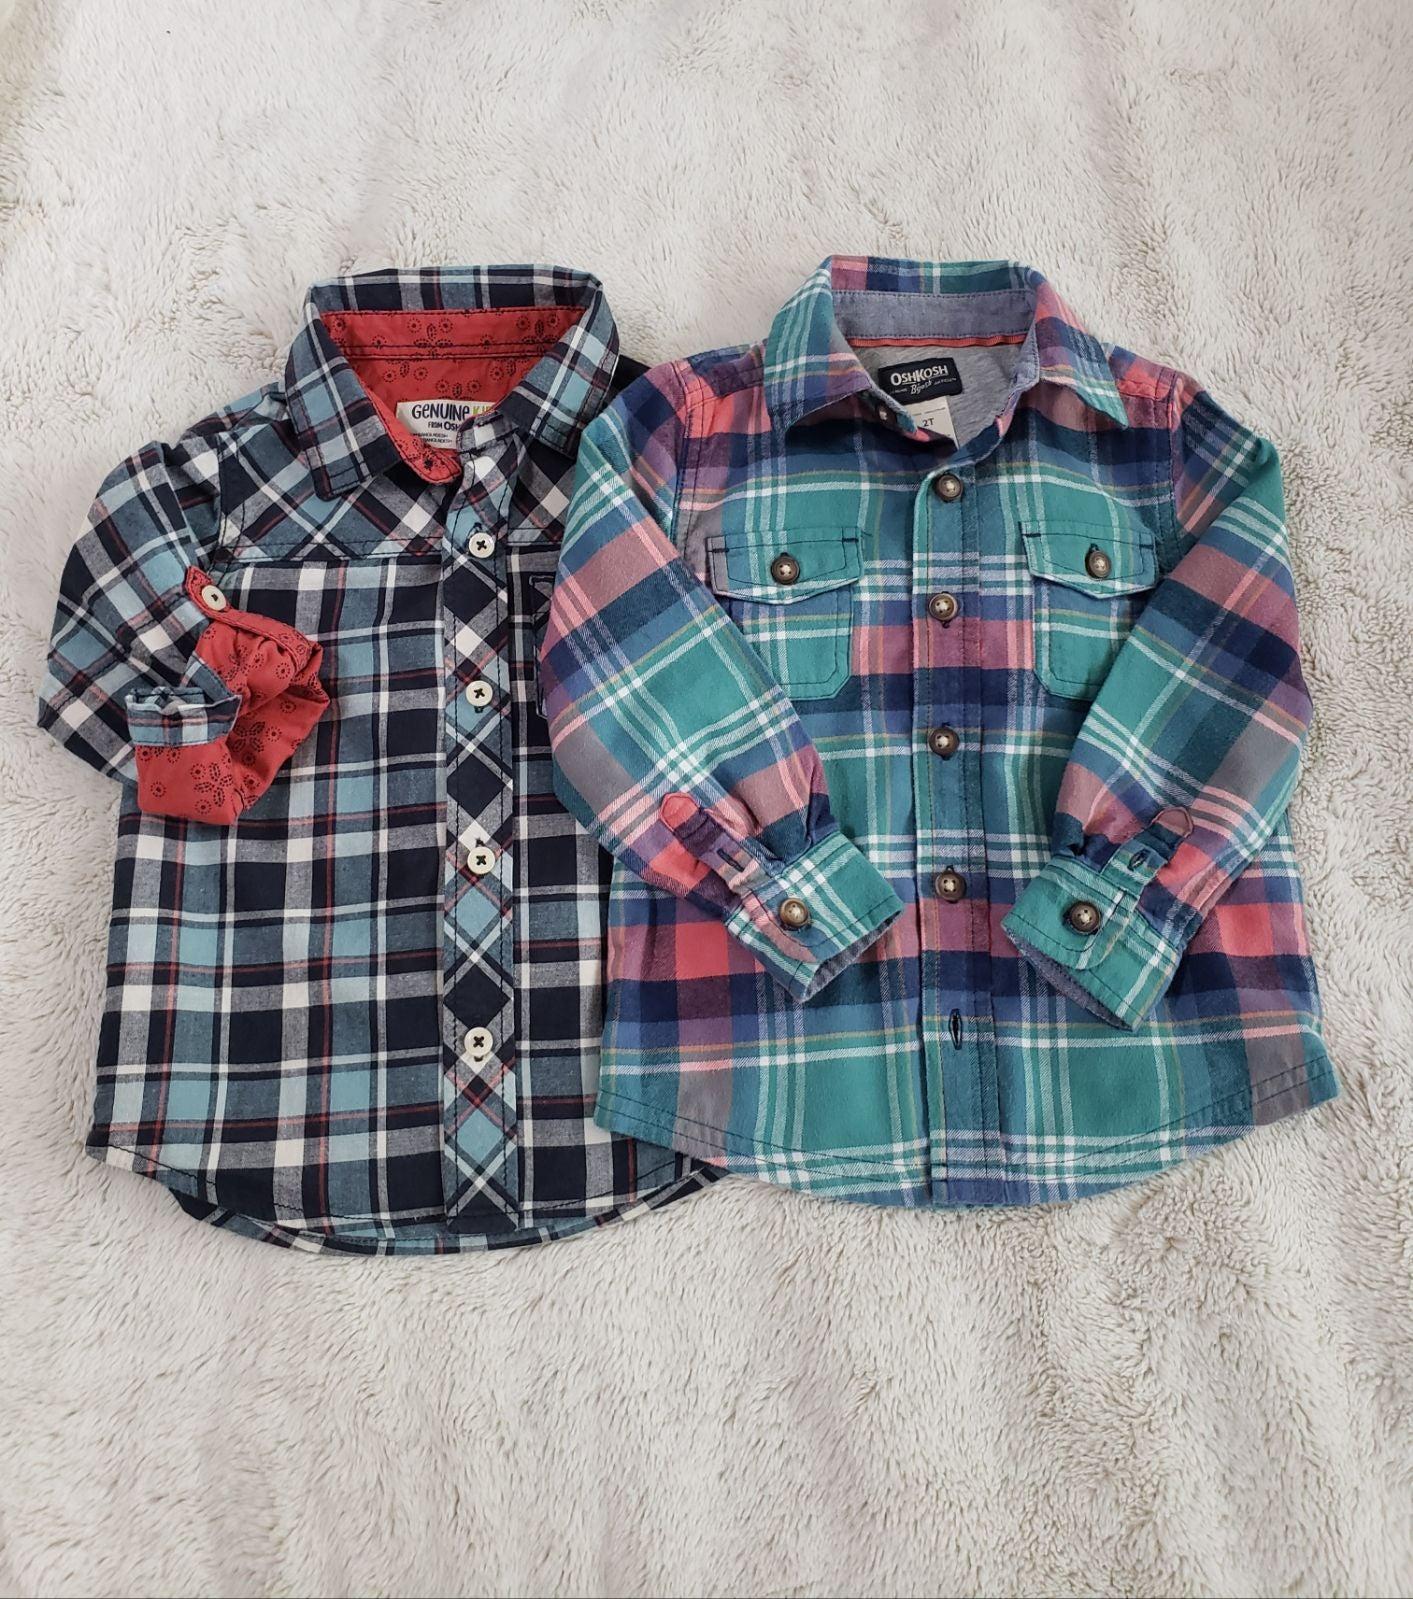 Oshkosh toddler button down shirts